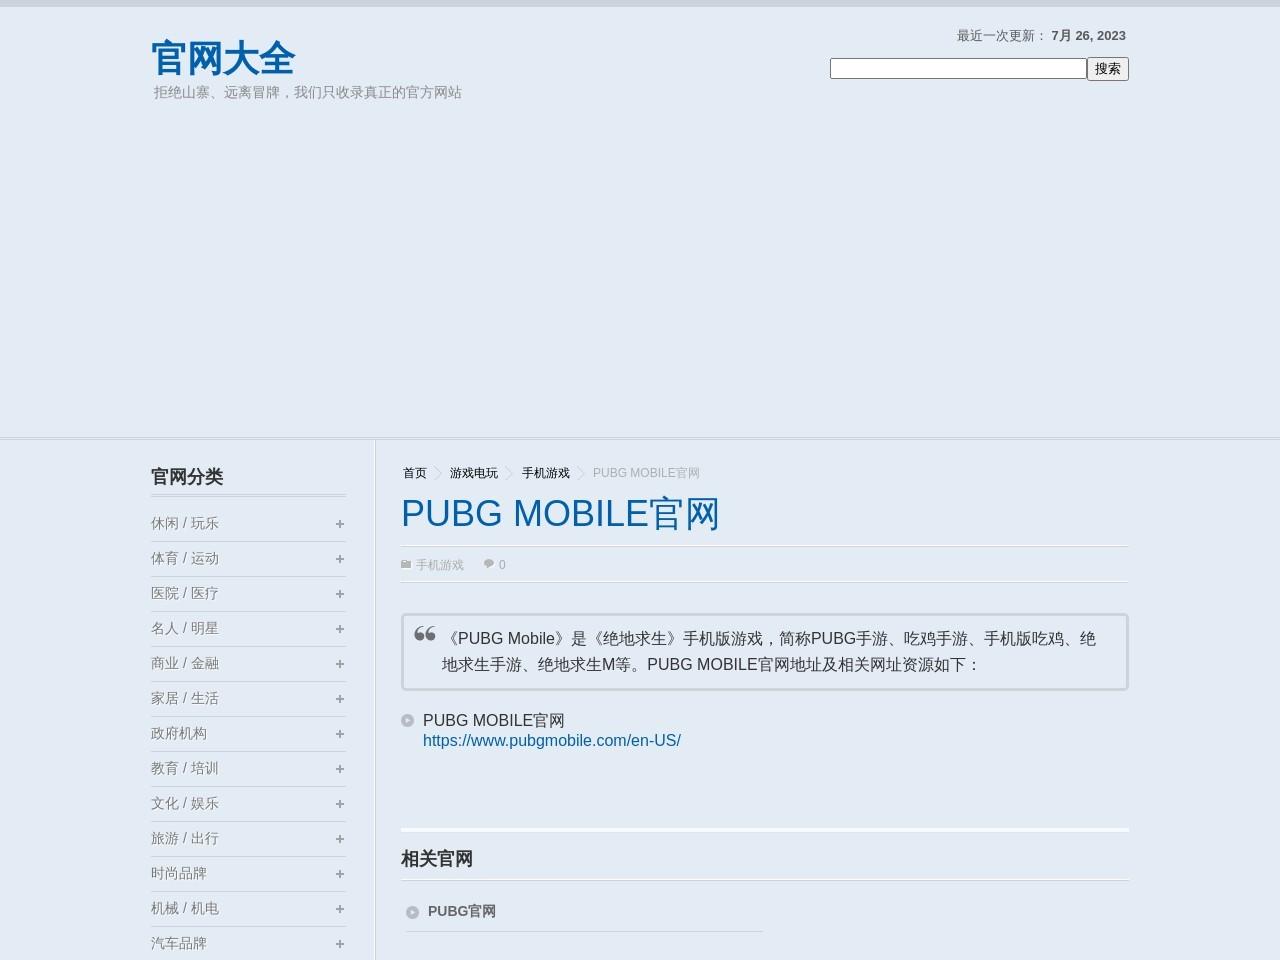 PUBG MOBILE官网-官网大全将带你进入真正的PUBG MOBILE官网